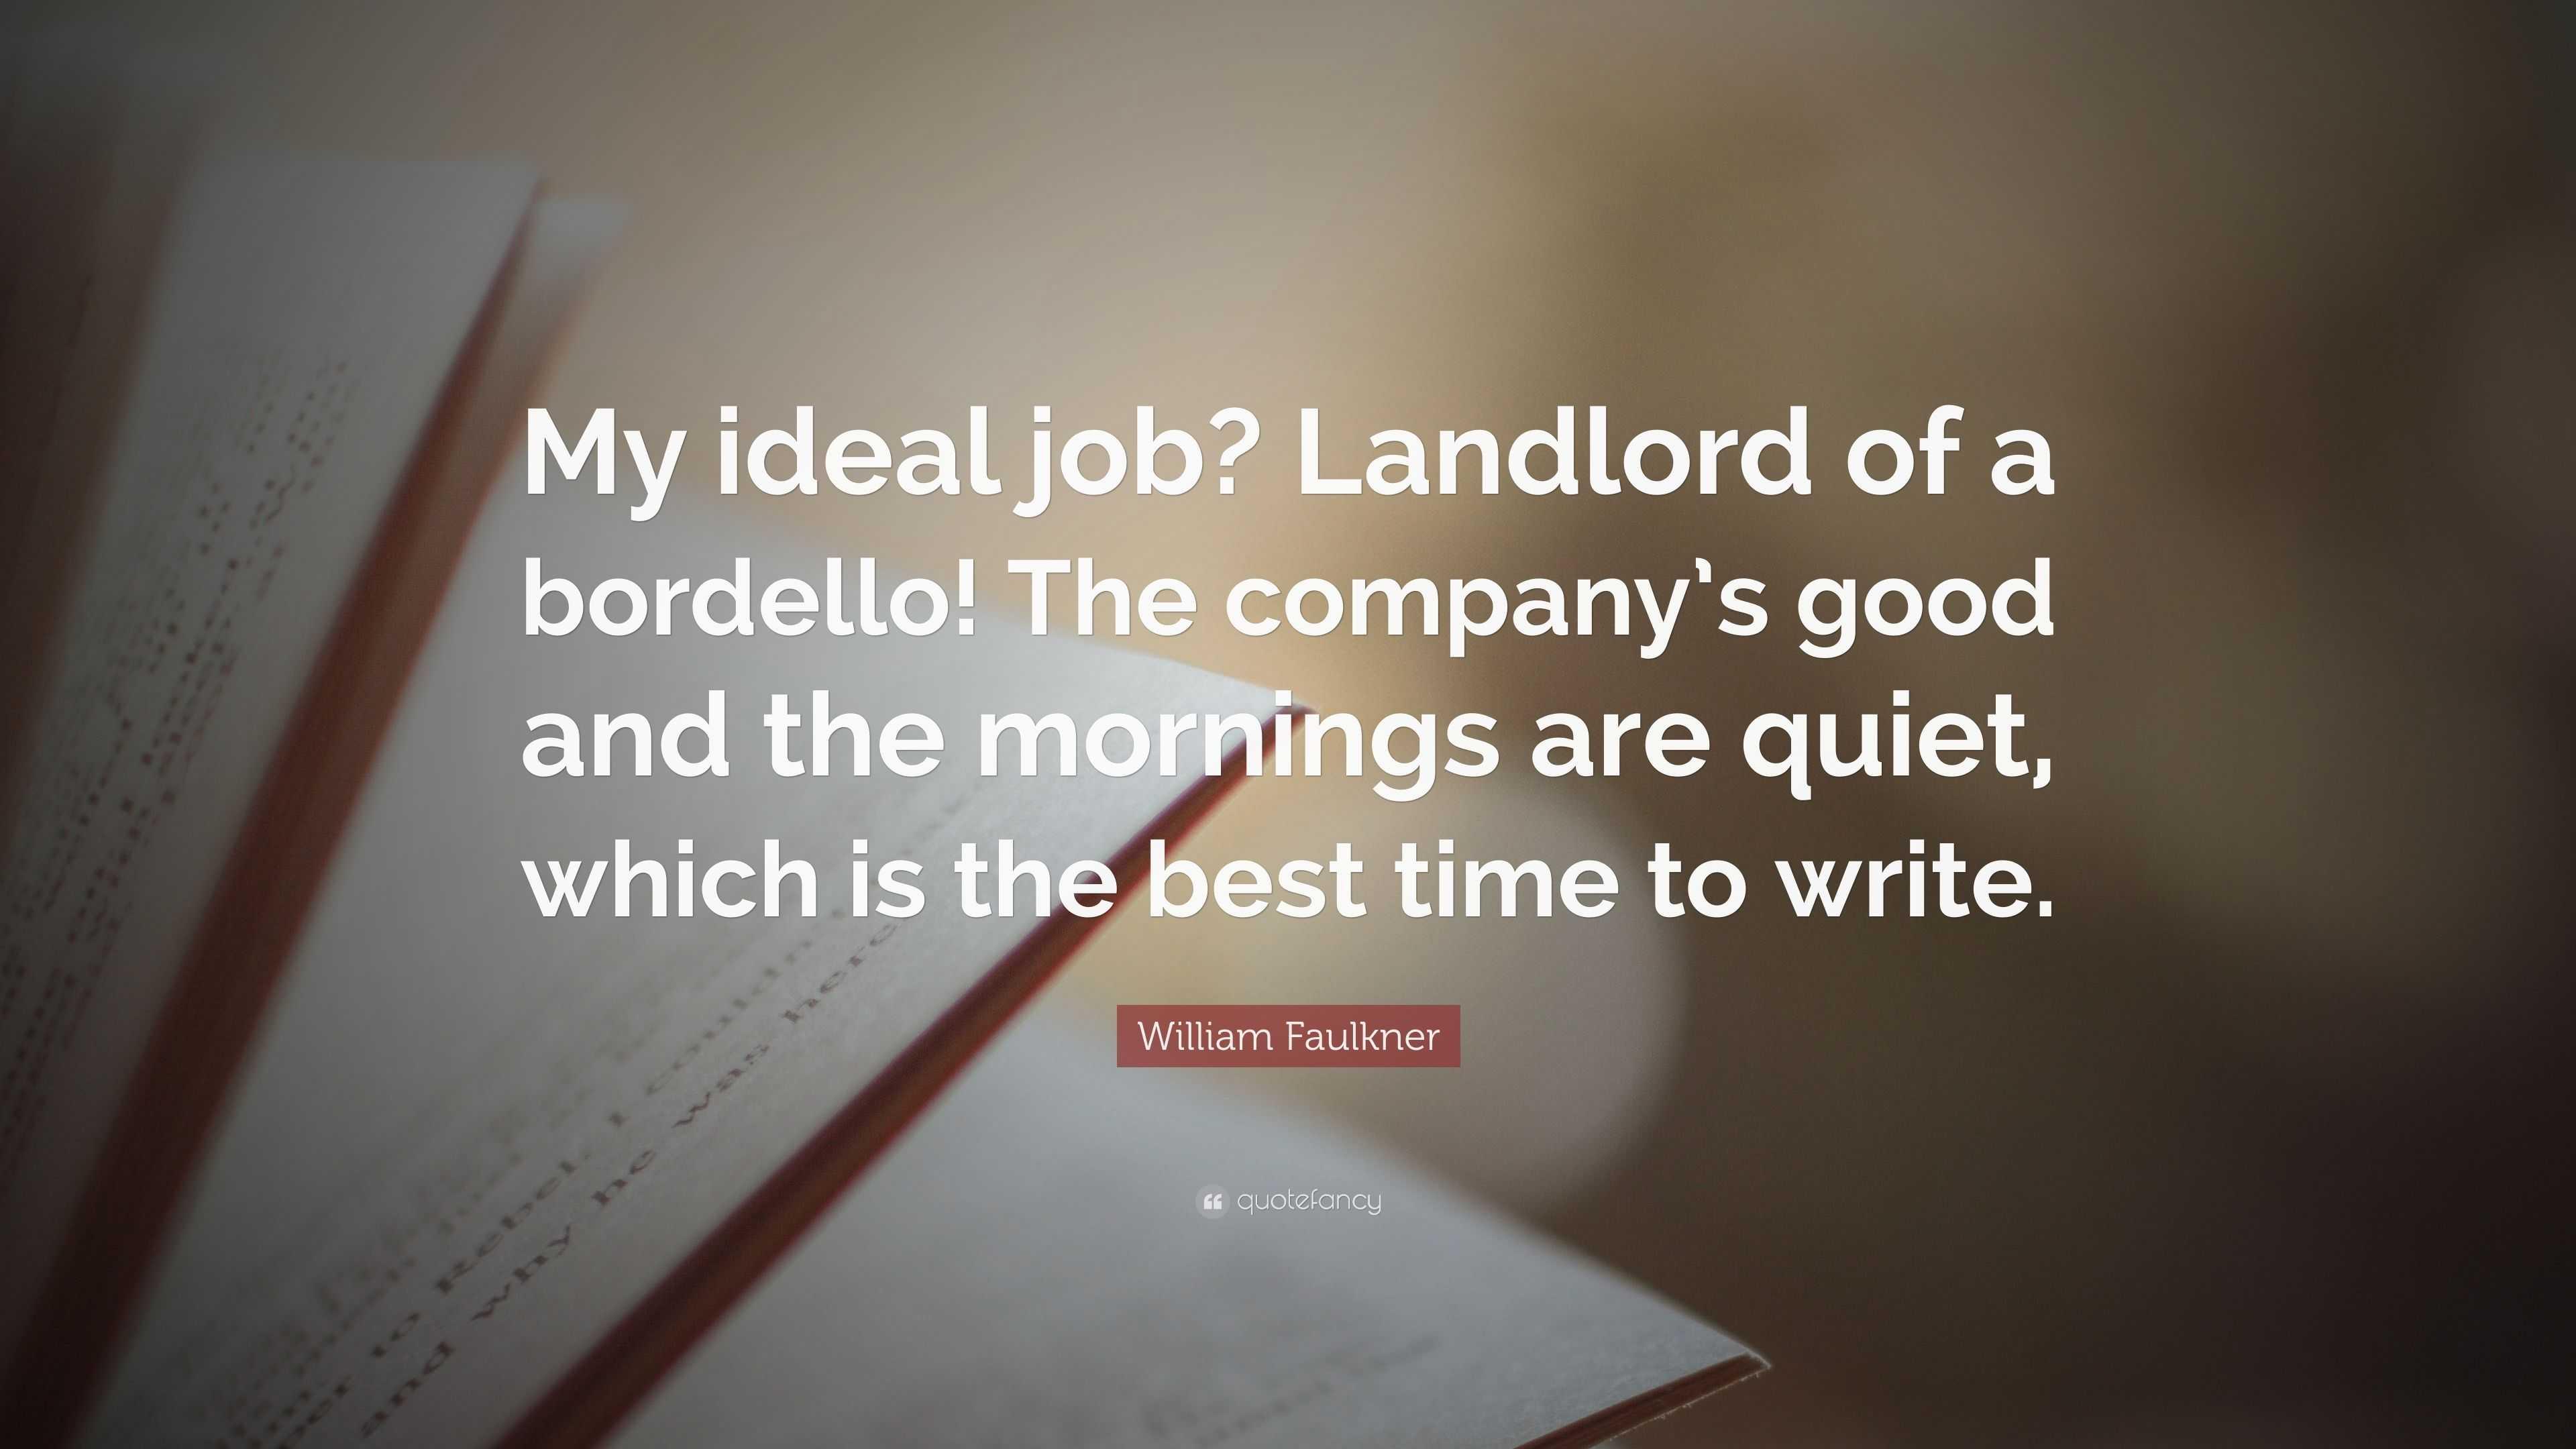 My ideal job essay